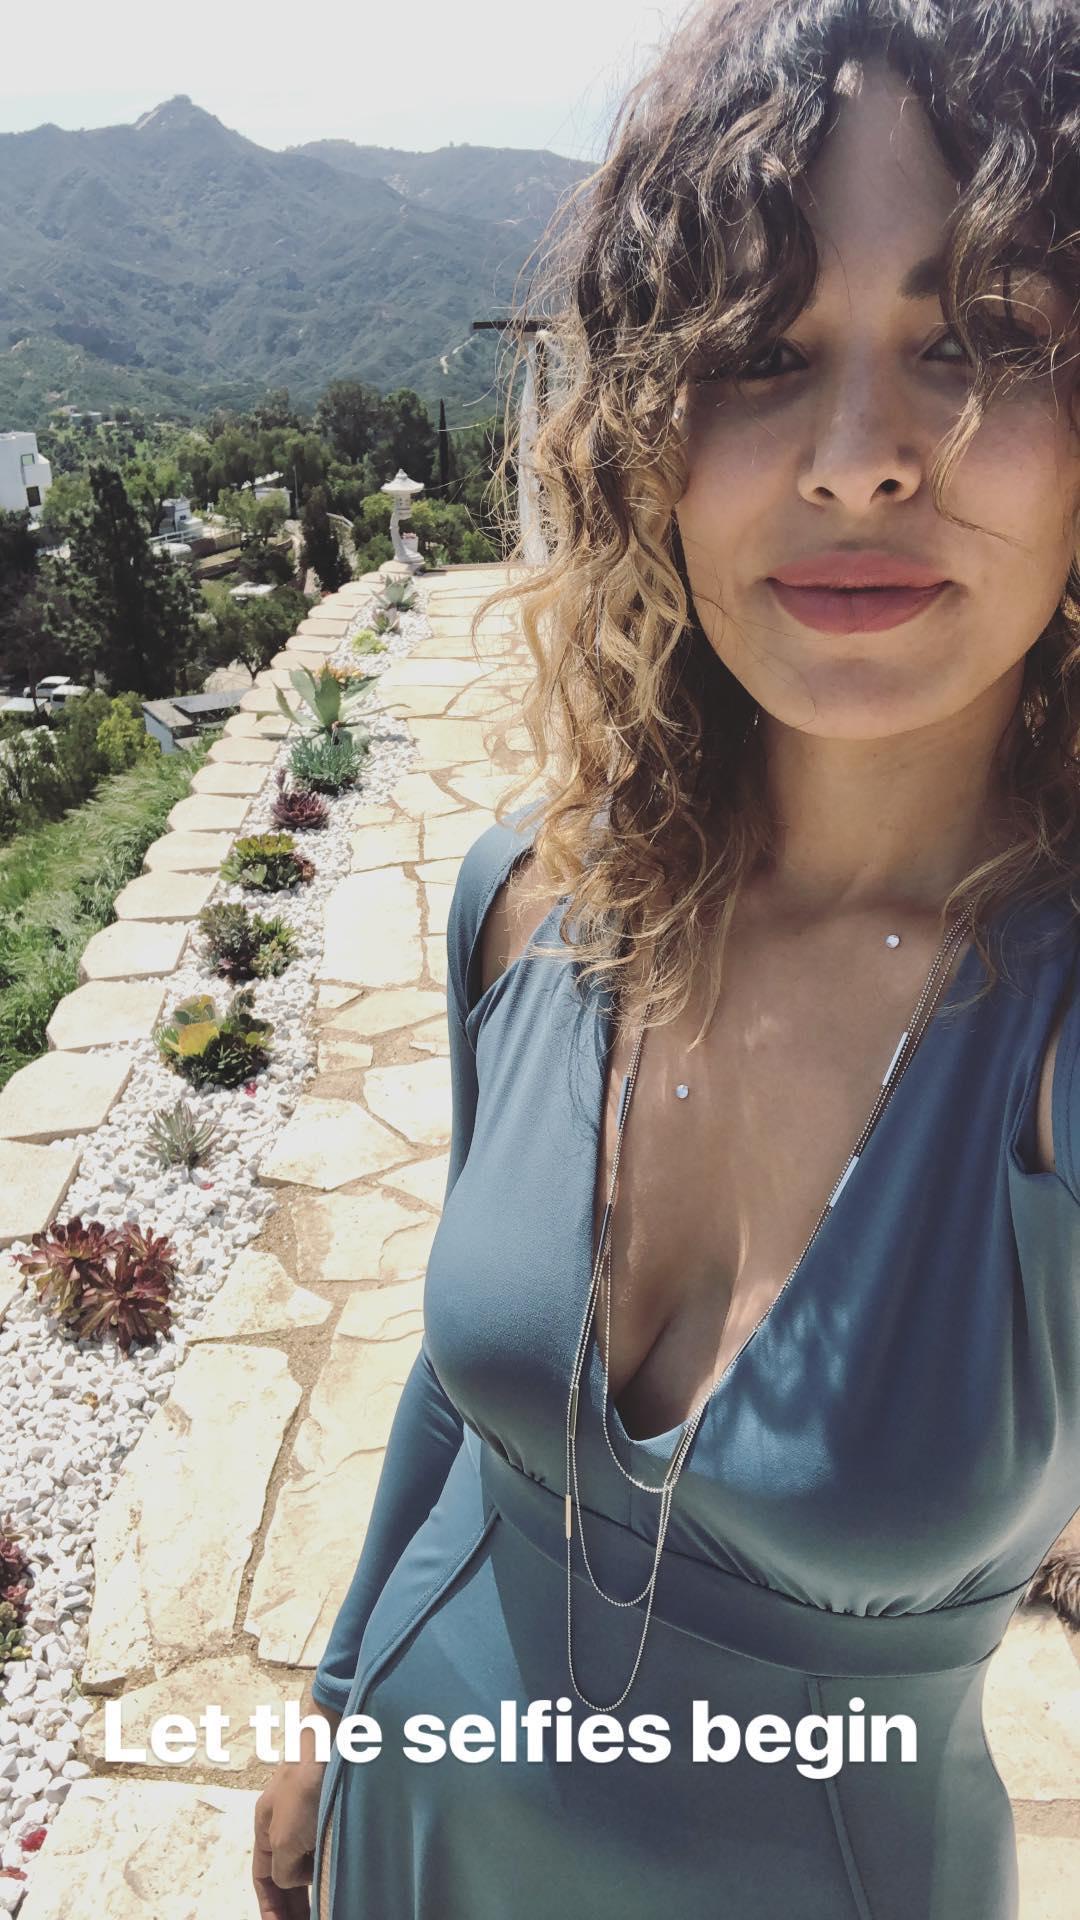 Selfie Nadine Velazquez nude photos 2019